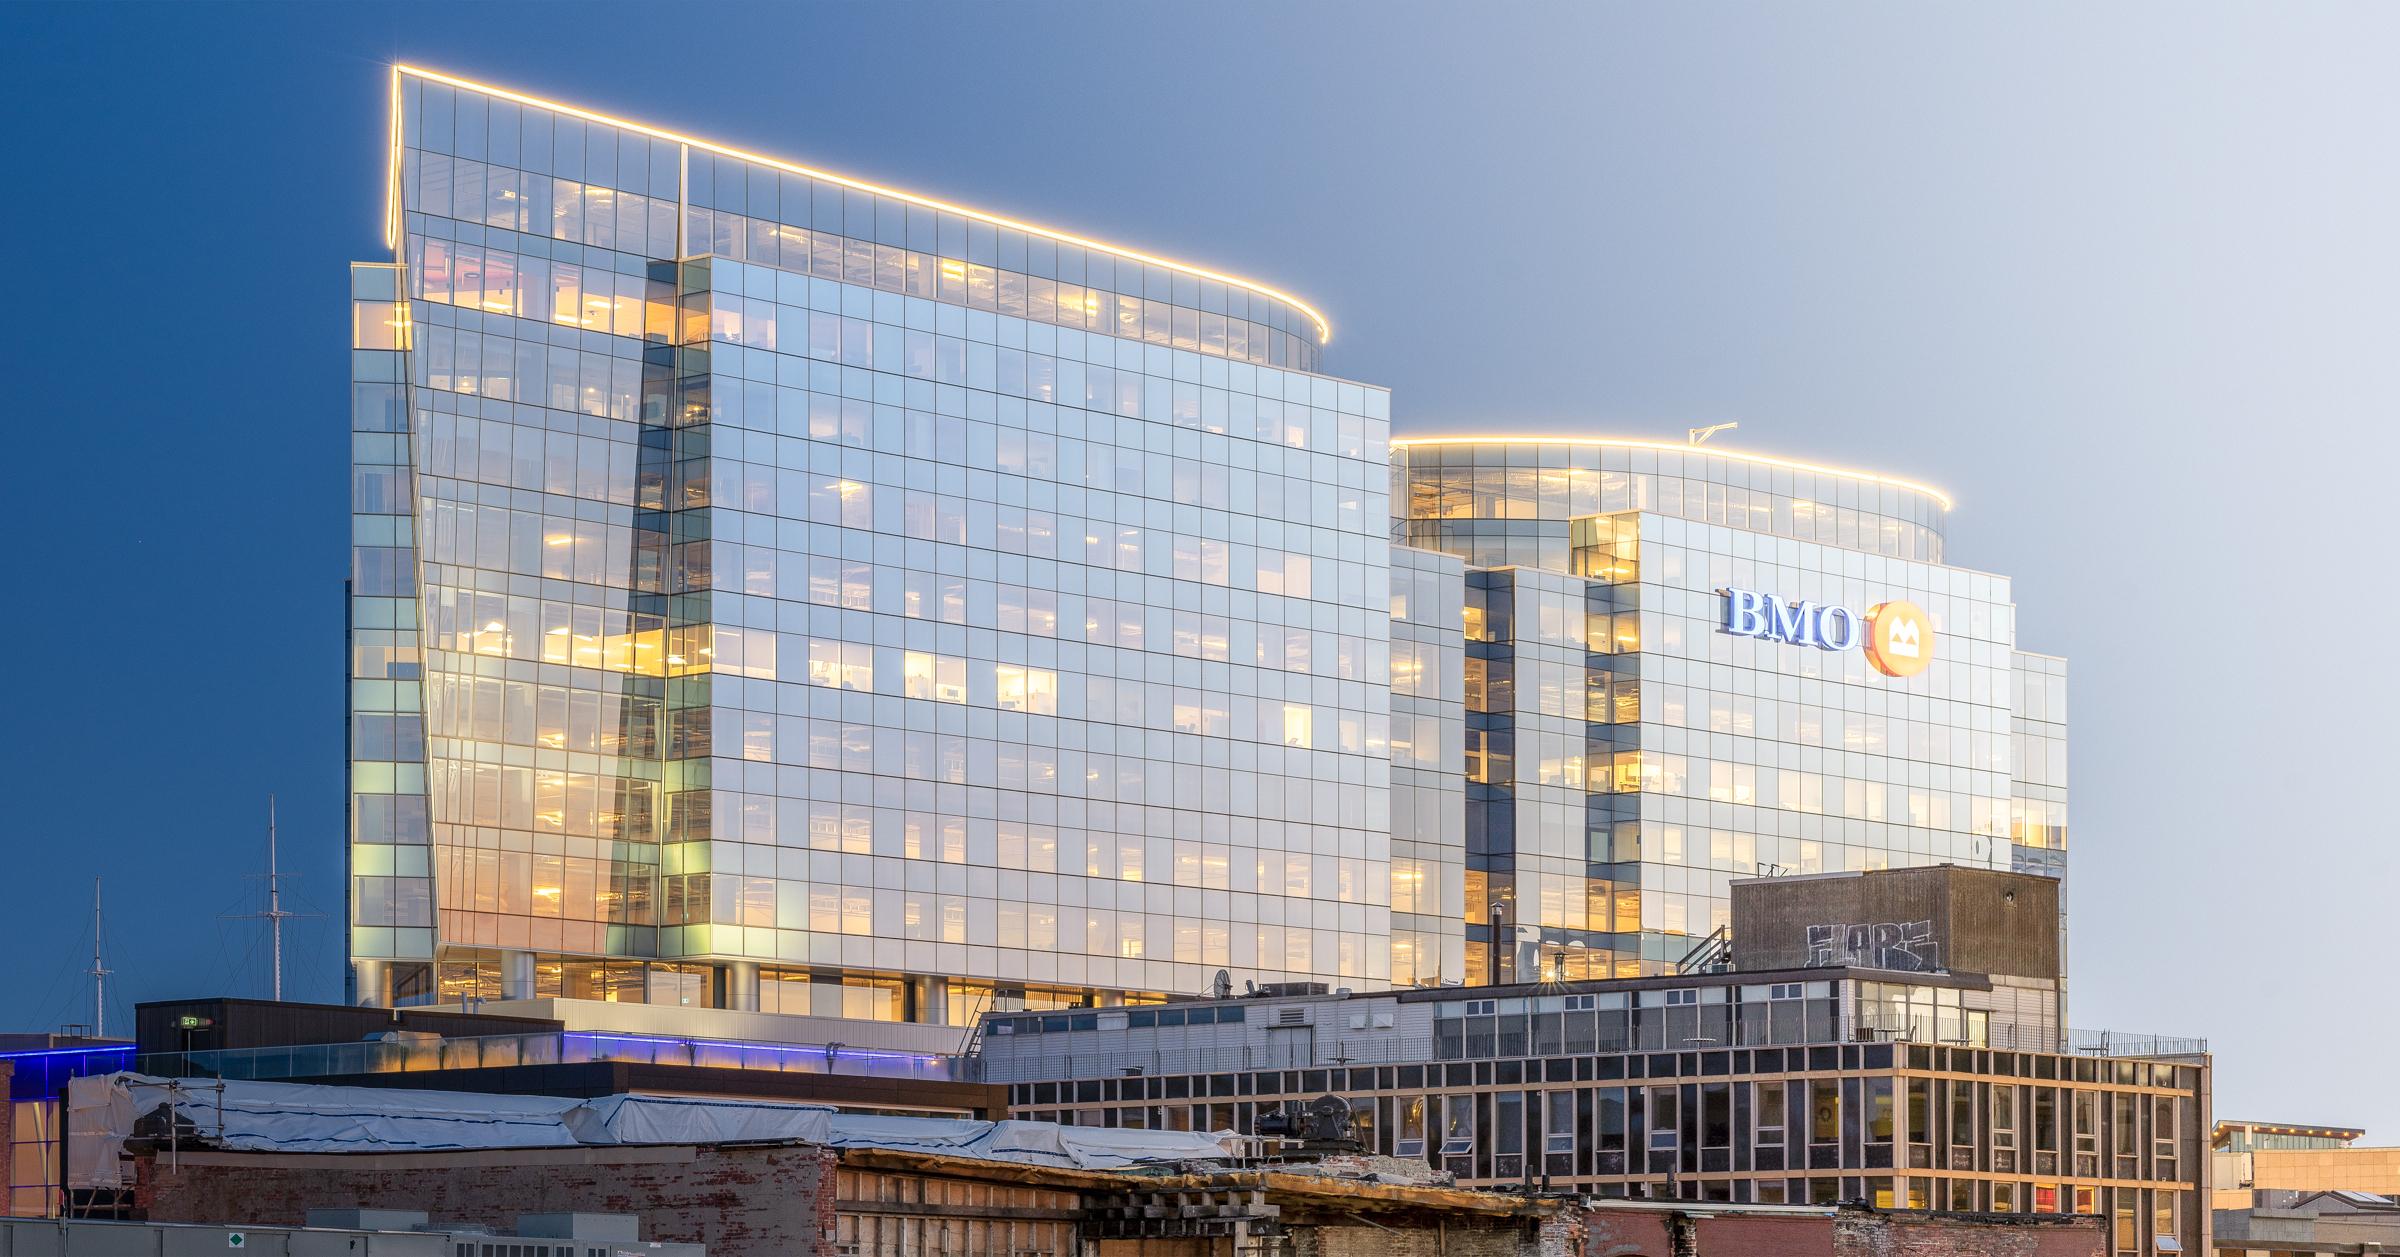 Halifax Convention Centre | Fraser Photography | Halifax, Nova Scotia